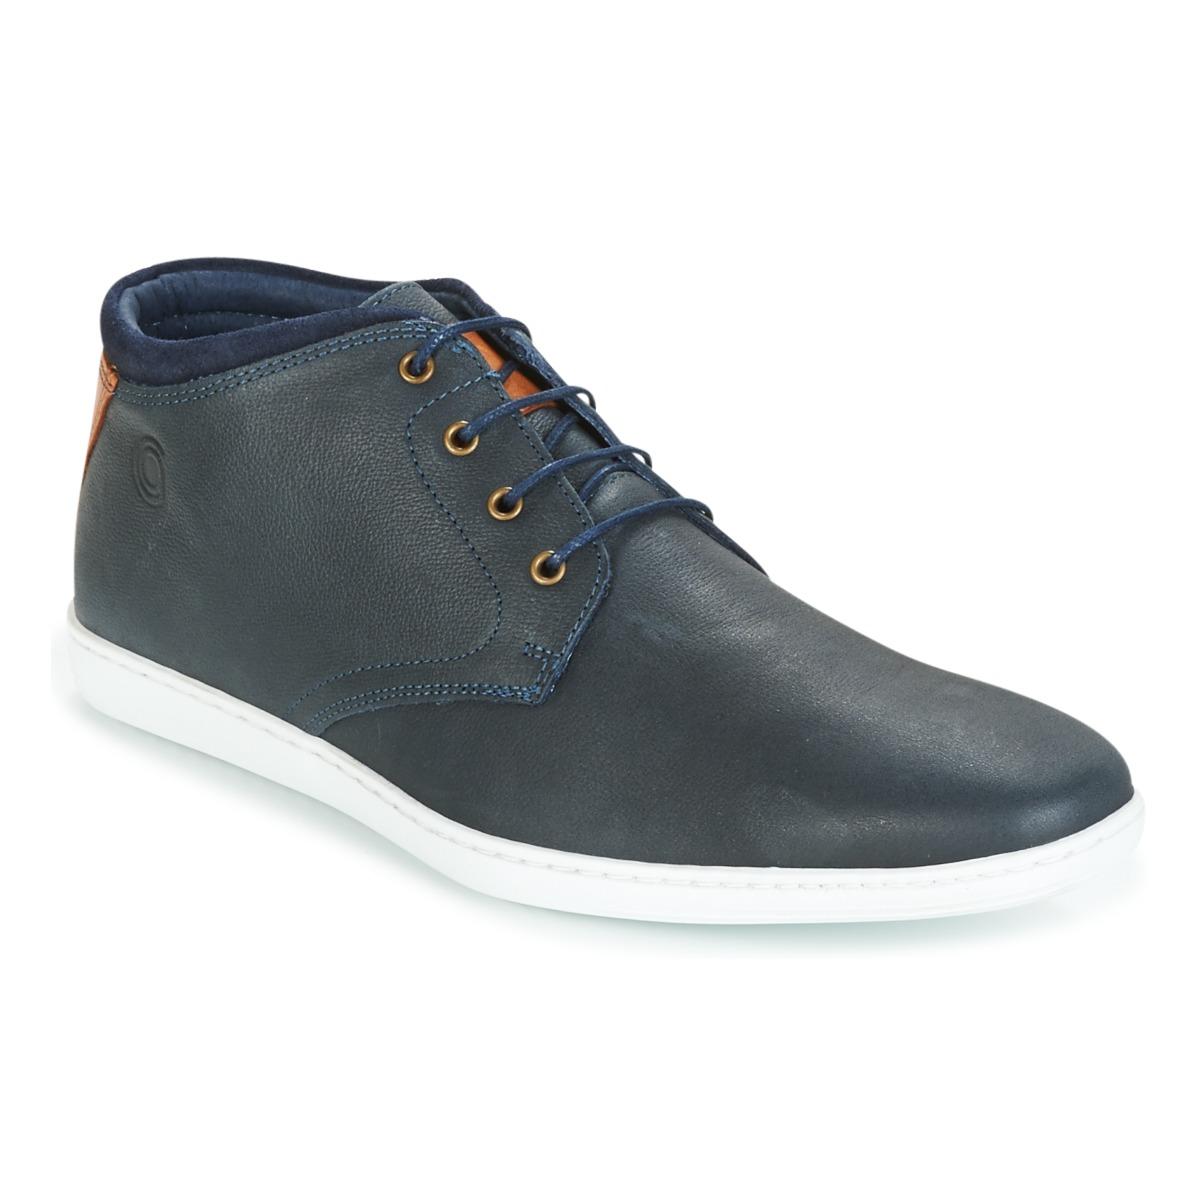 Casual Attitude CALER Marine - Kostenloser Versand bei Spartoode ! - Schuhe Sneaker High Herren 52,49 €